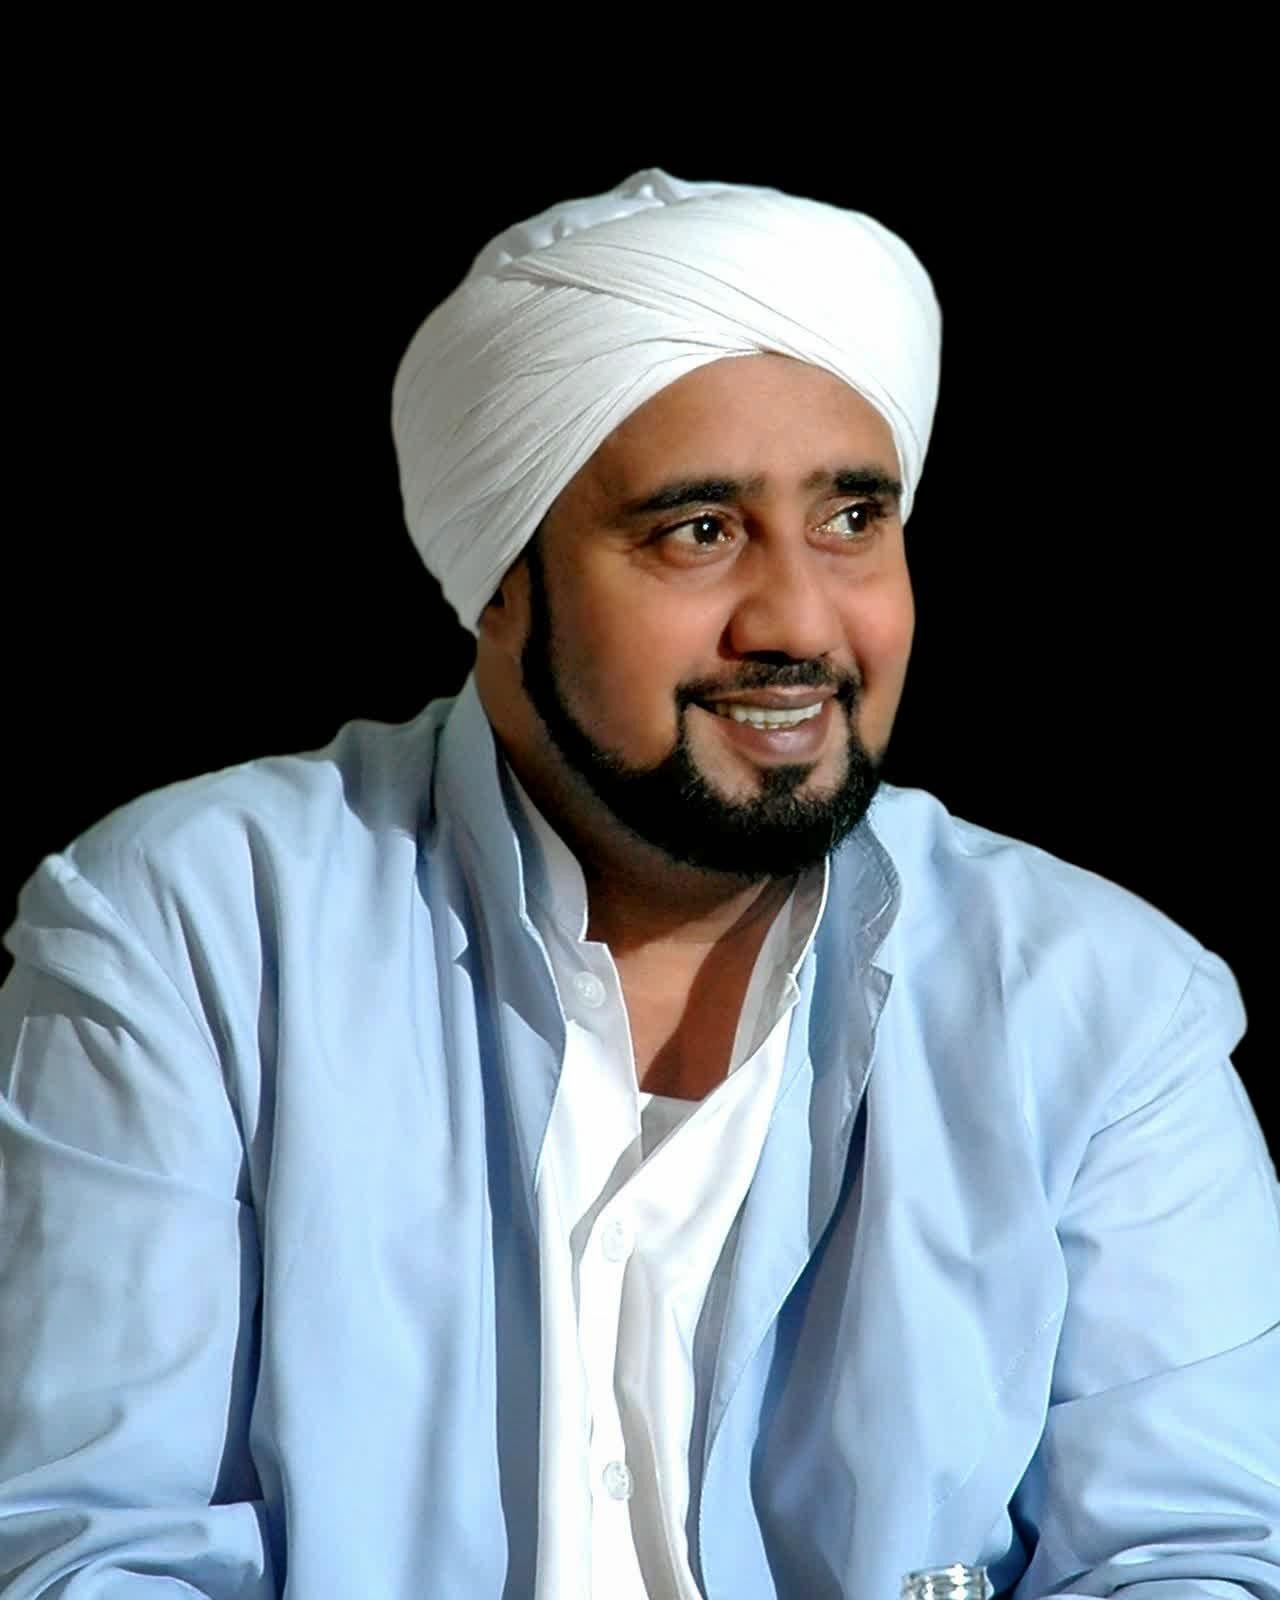 Kumpulan Foto Habib Syech Bin Abdul Qodir Assegaf Terbaru Fiqihmuslim Com